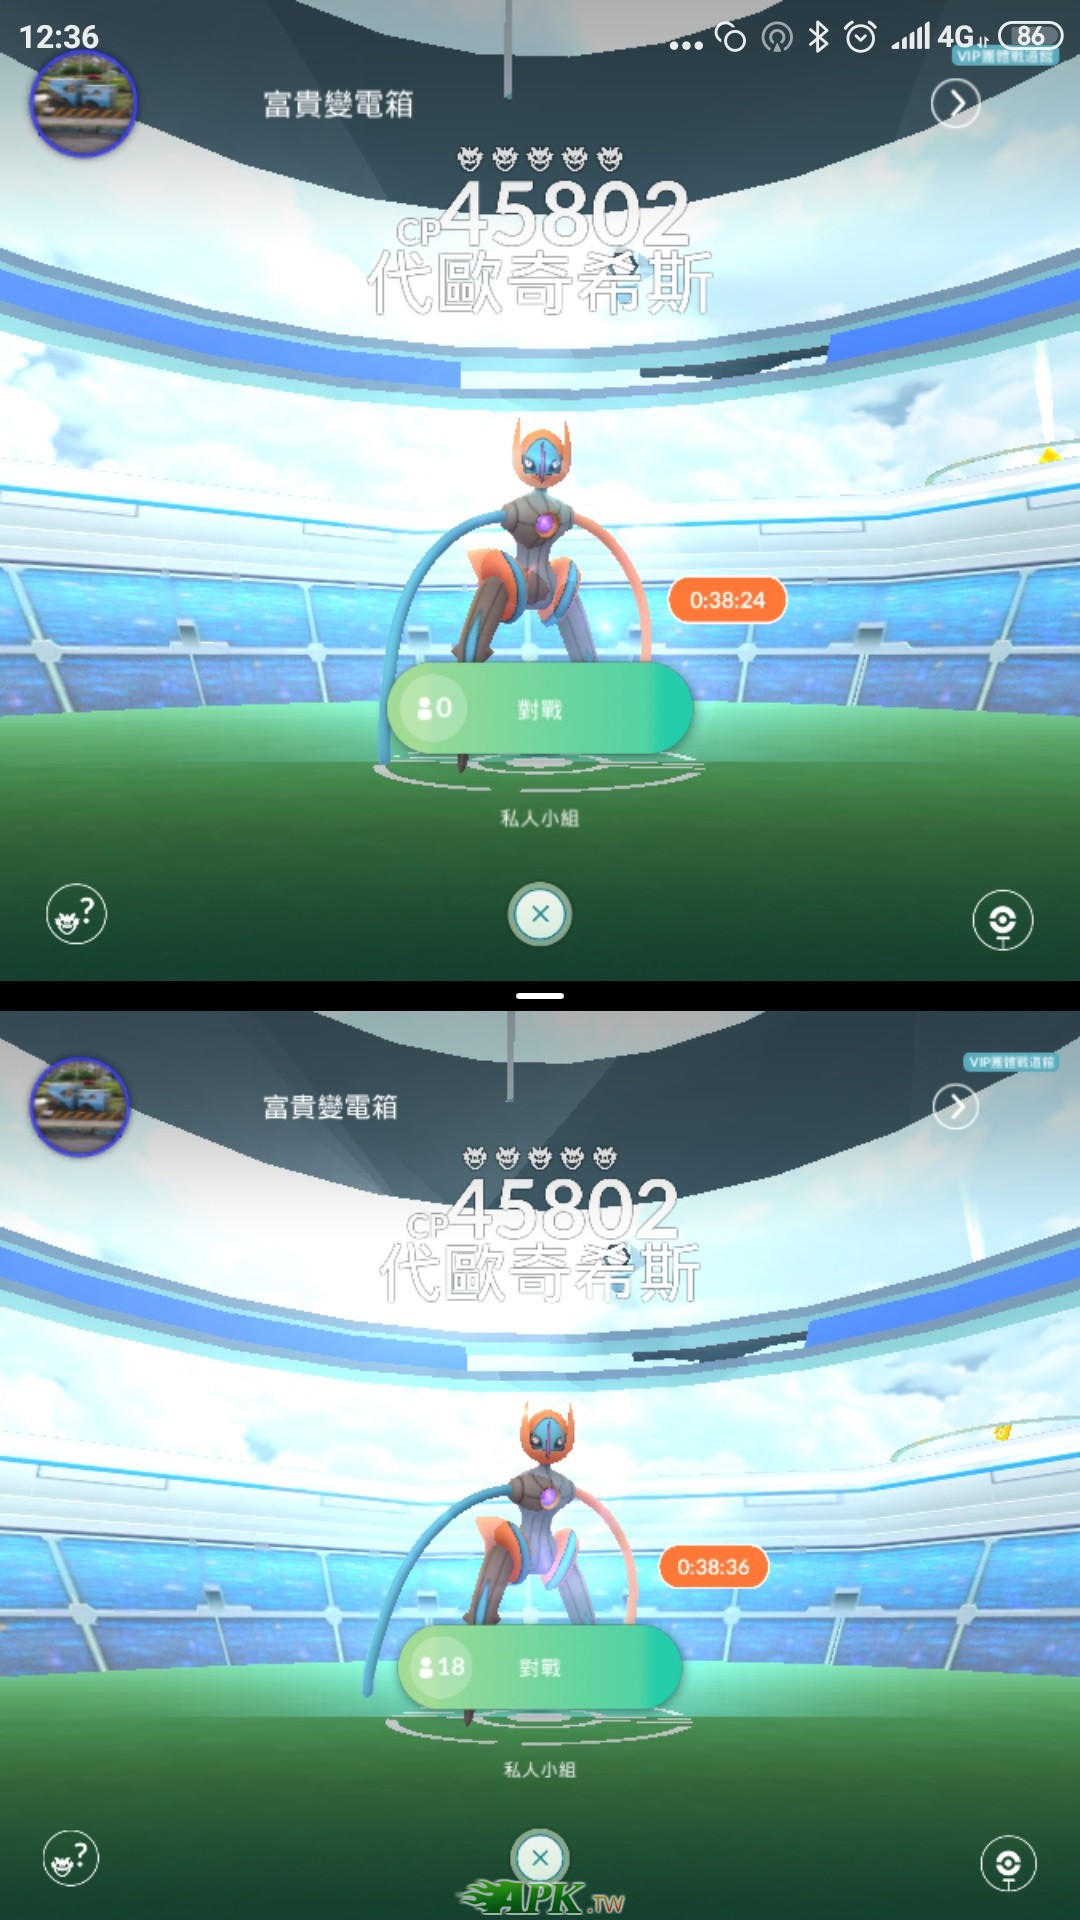 Screenshot_2019-07-02-12-36-35-187_com.nianticlabs.pokemongo.jpg